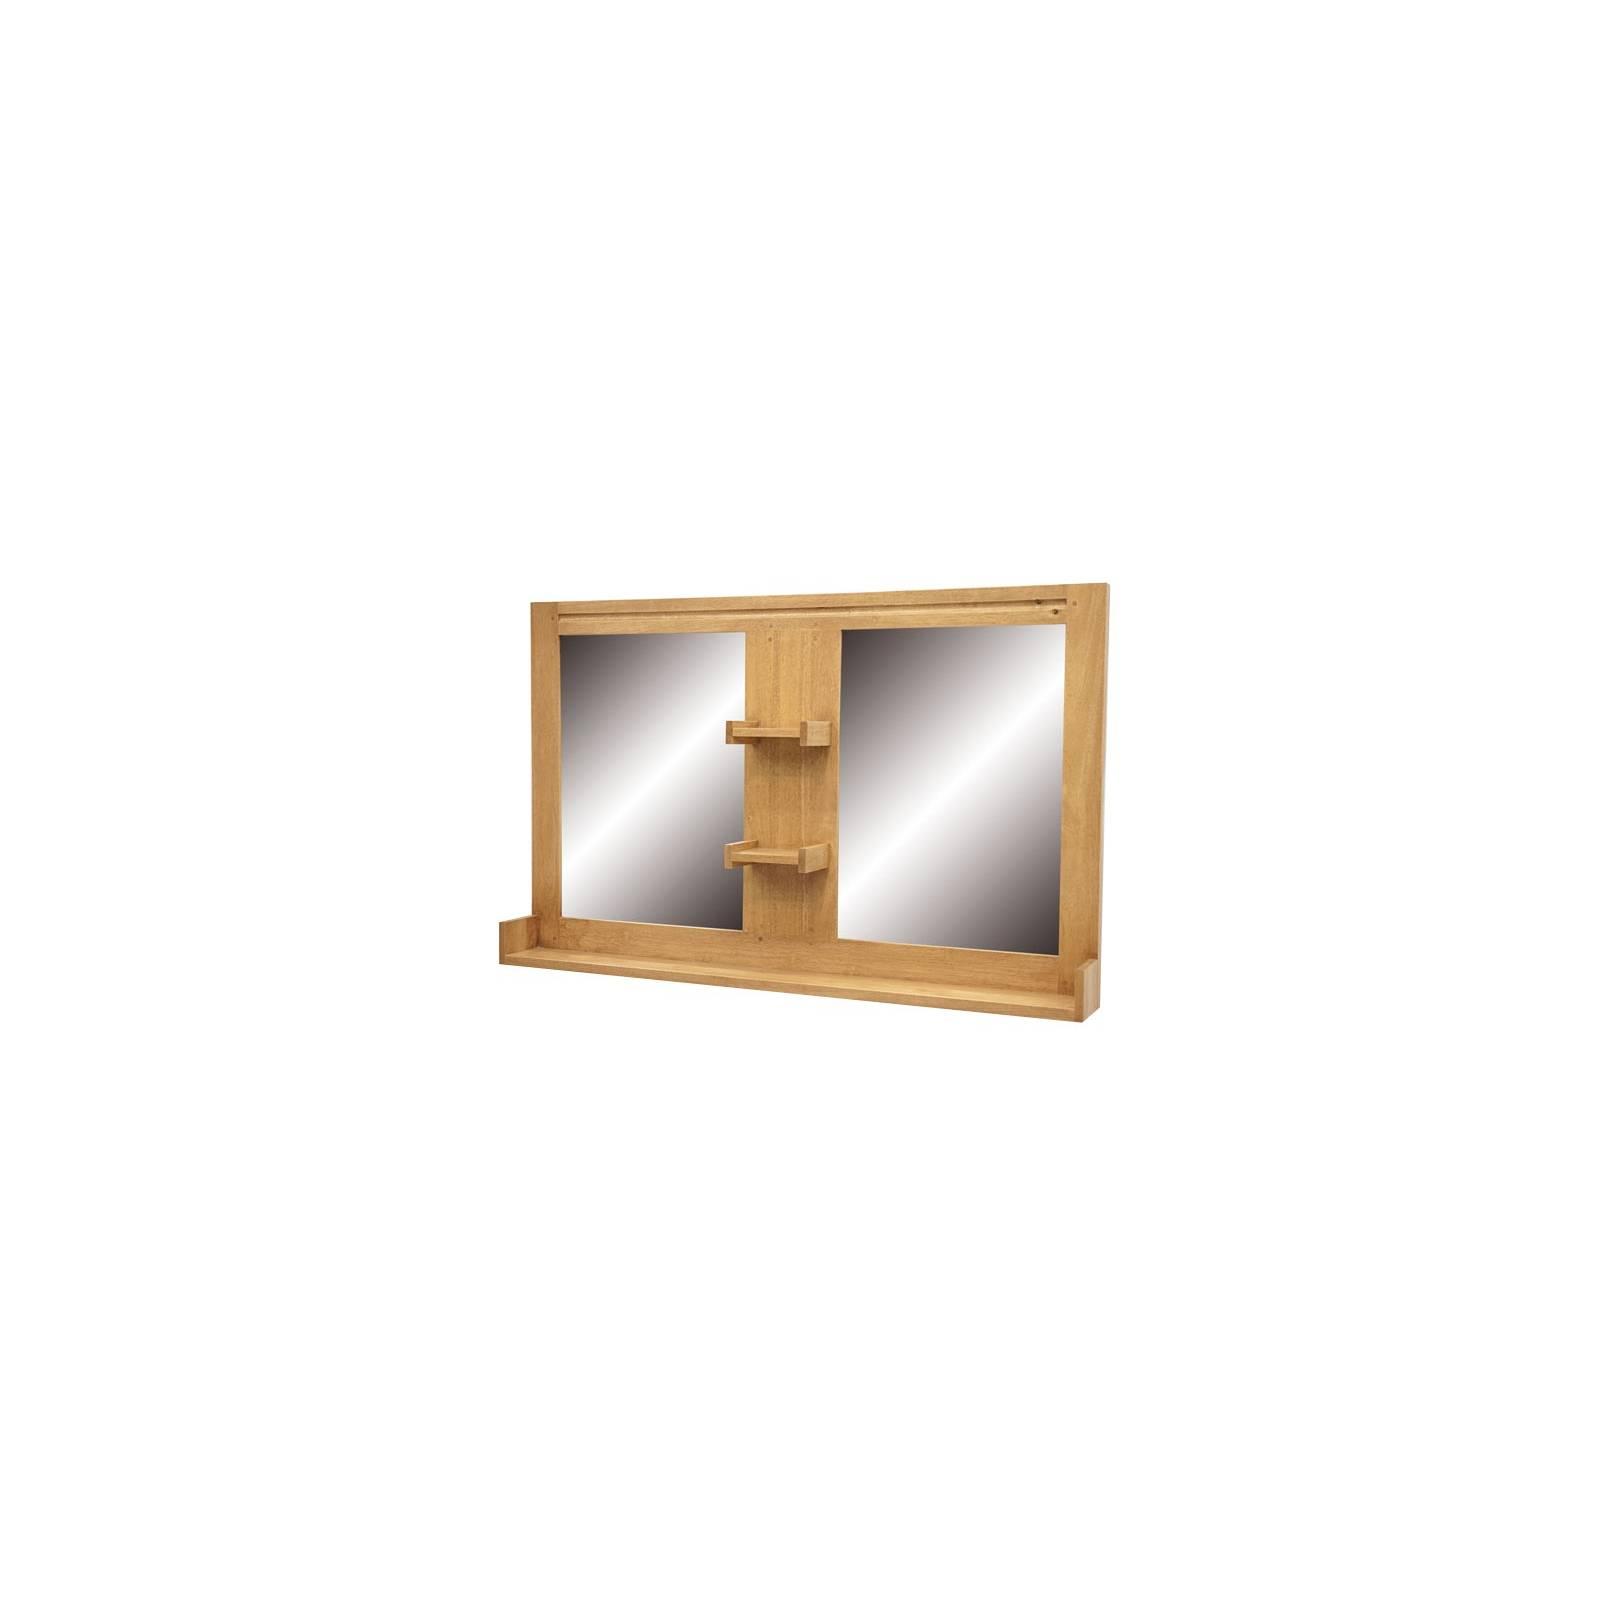 Miroir Double Salle De Bain Fjord Hévéa - meuble déco